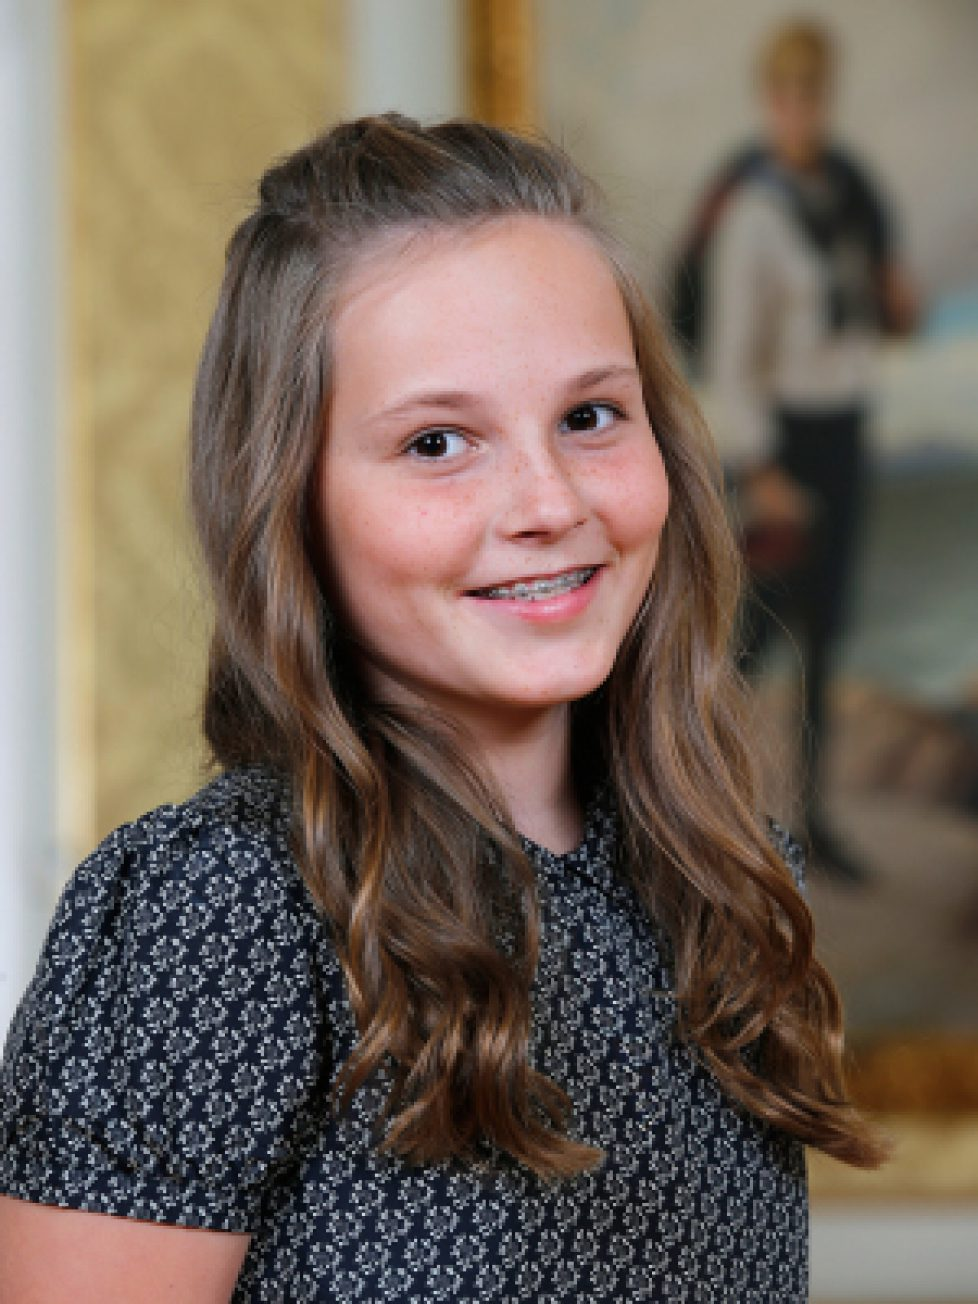 Les 13 ans d'Ingrid Alexandra de Norvège